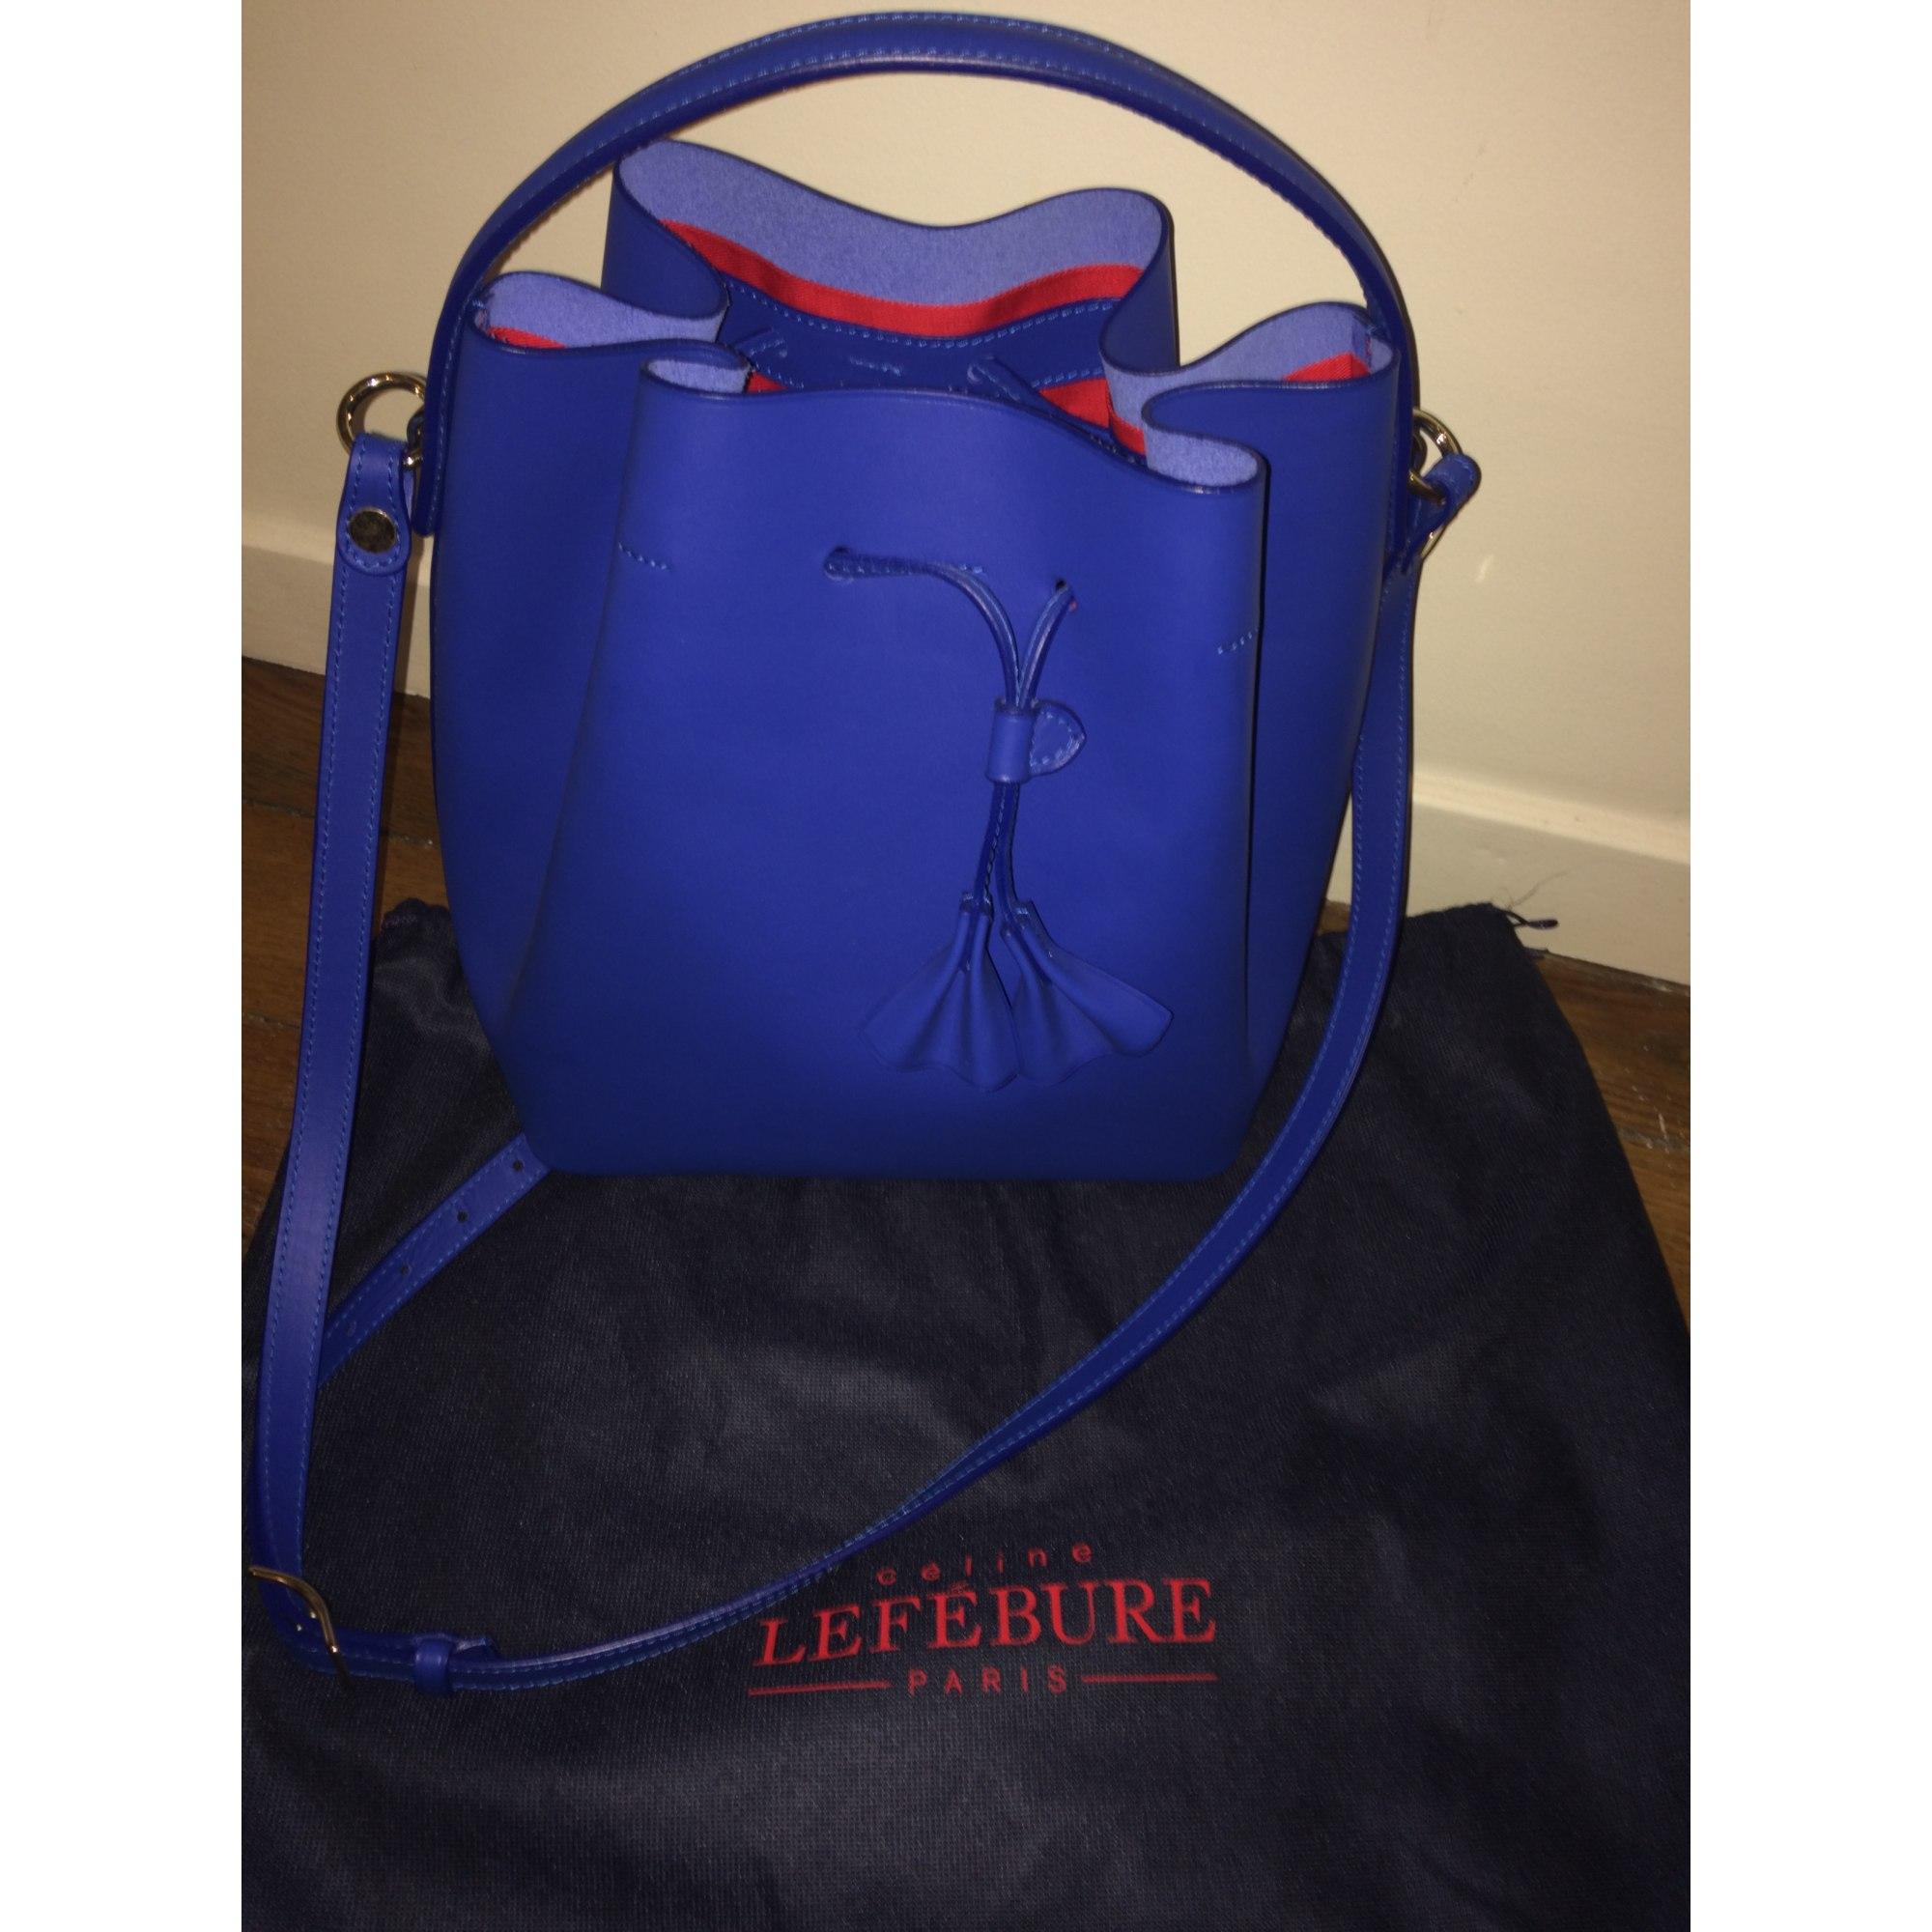 CÉLINE bandoulière 5332112 Sac cuir LEFEBURE en bleu en wUwBIq 2613a2773462